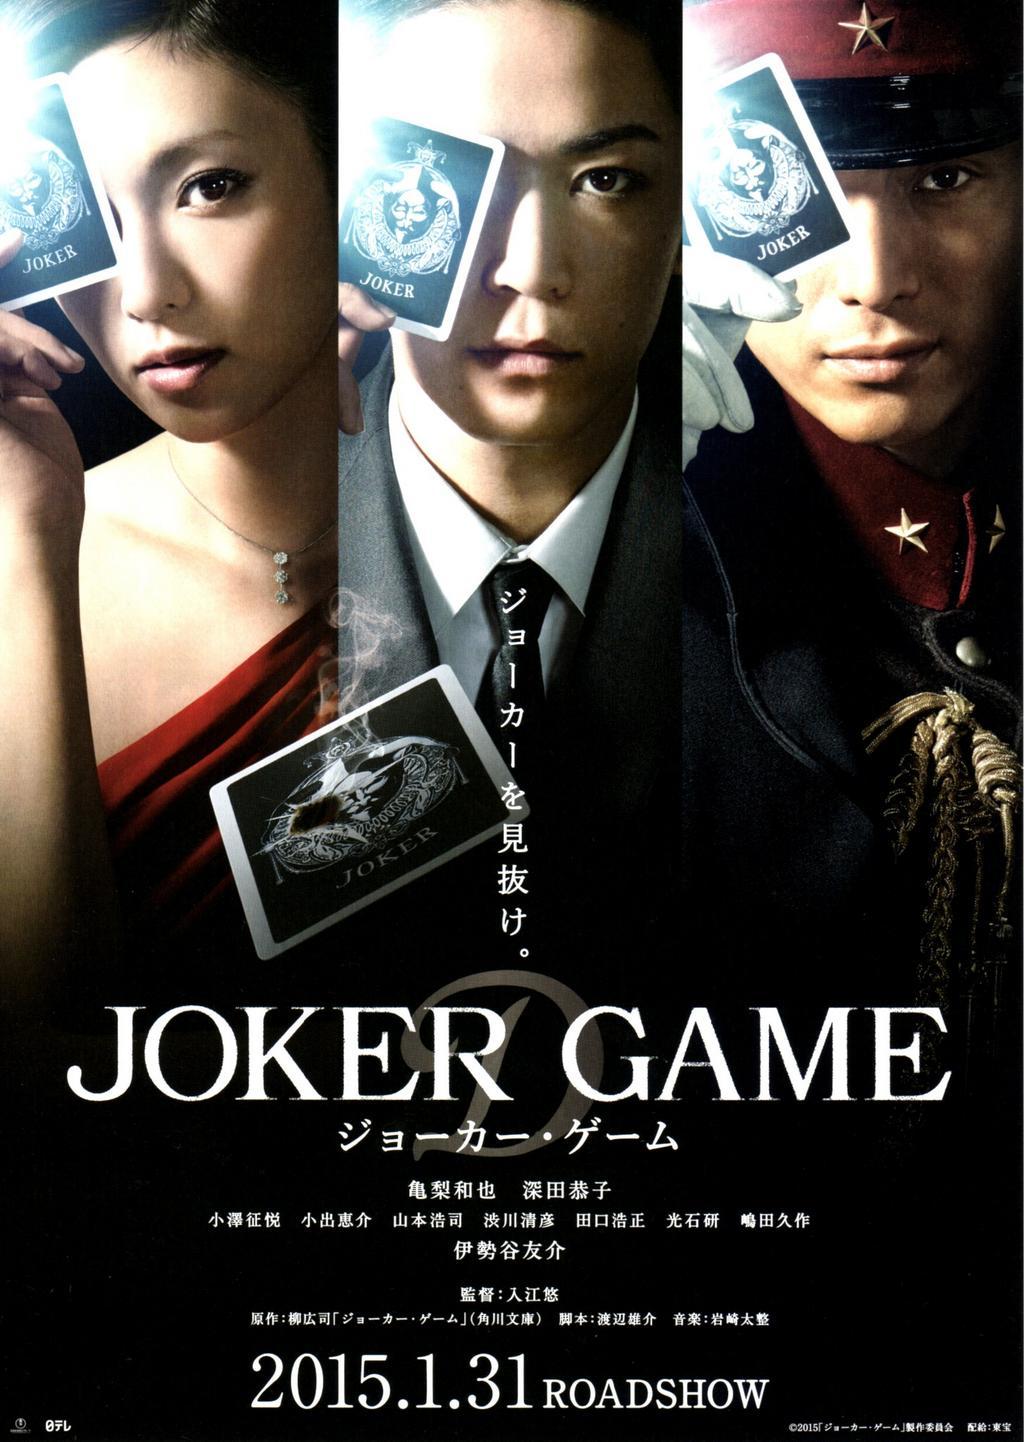 Joker Game โจ๊กเกอร์ เกมส์ [HD][พากย์ไทย]